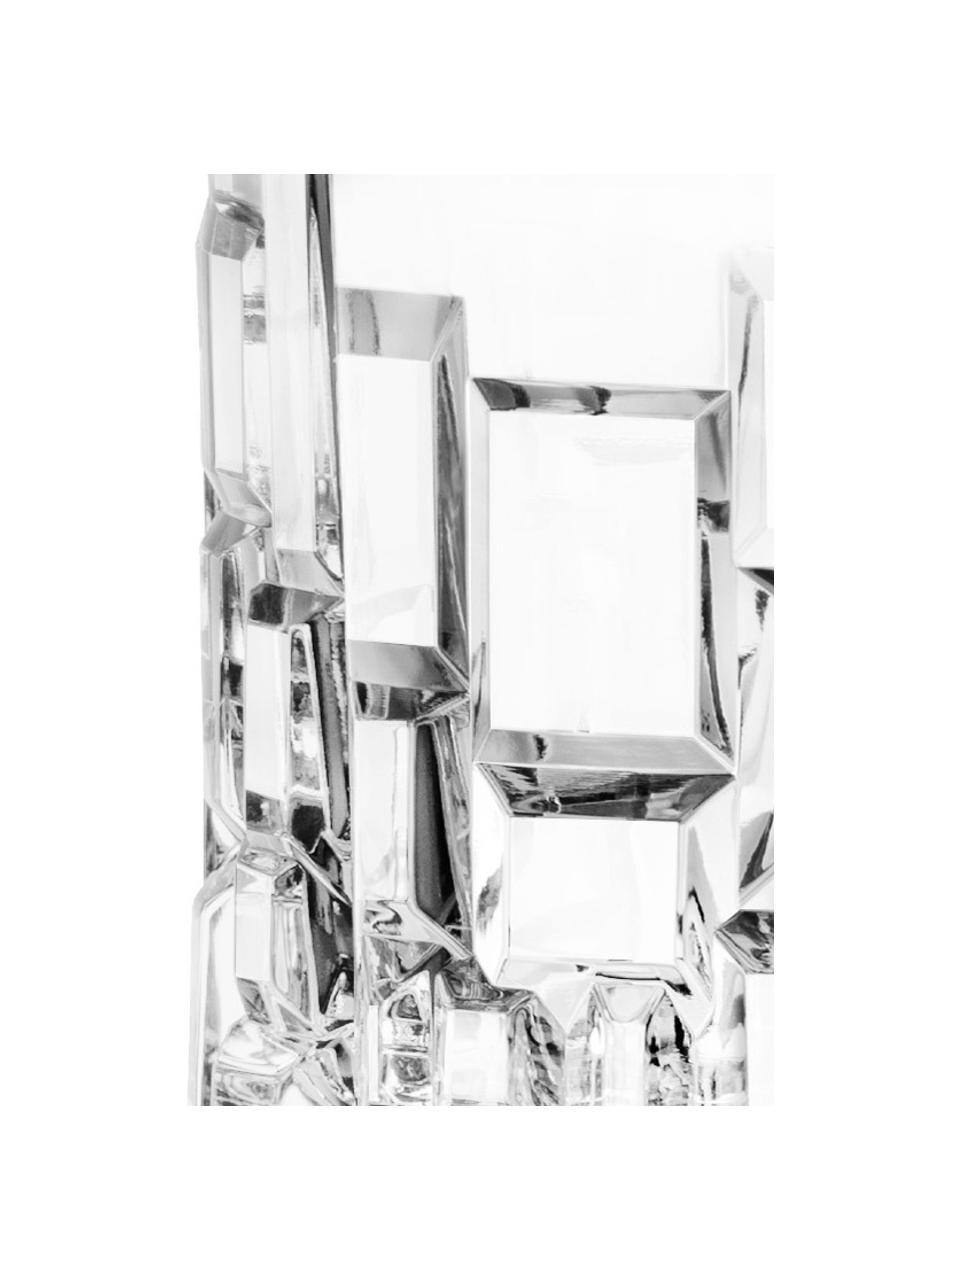 Kristallen glazen Etna met reliëf, 6 stuks, Kristalglas, Transparant, Ø 8 x H 9 cm